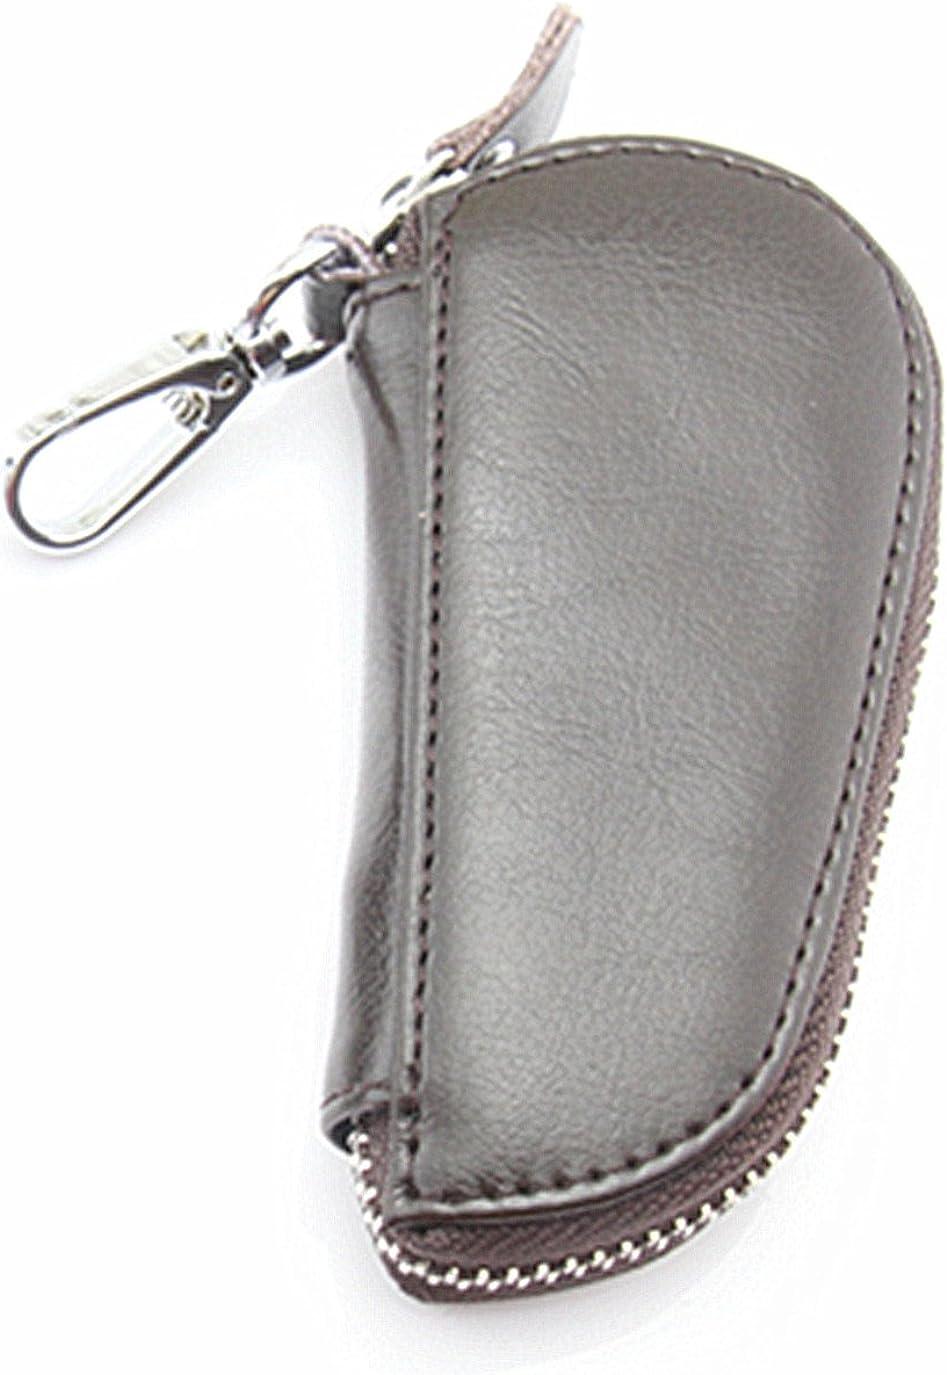 Zenness Key ChaINs Wallet Pocket Leather Key Holder Case